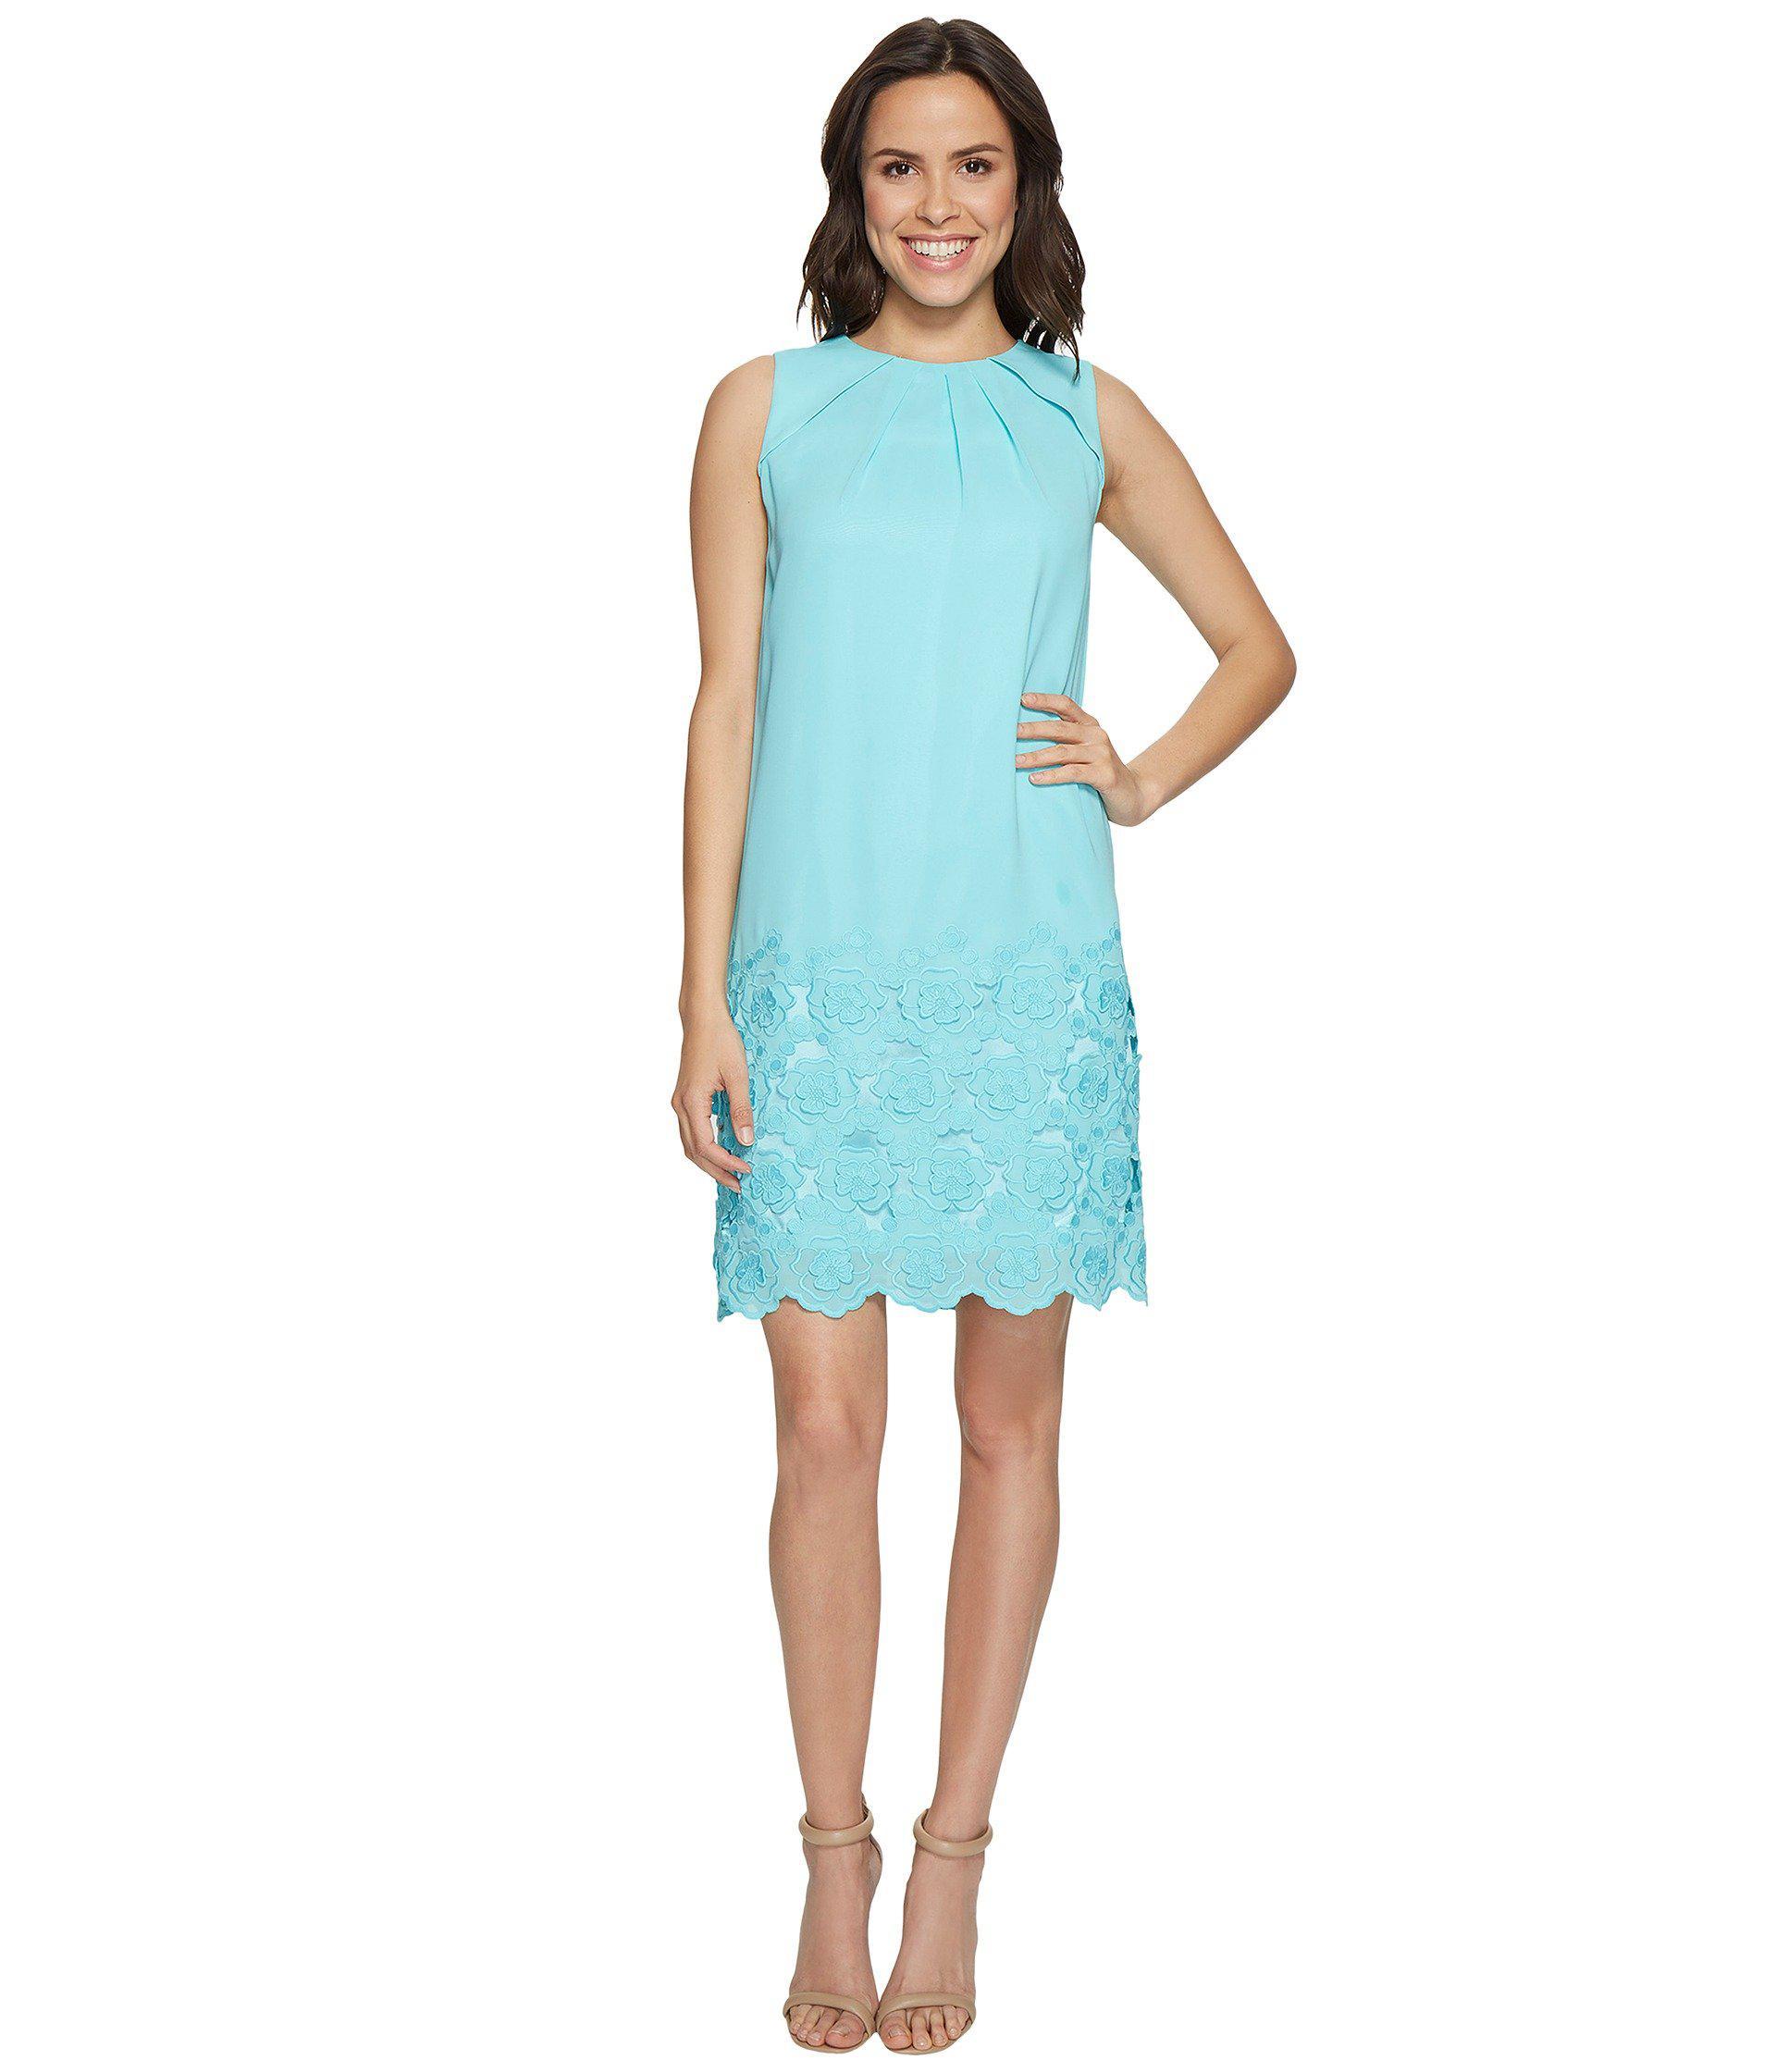 05358f7dad230 Lyst - Tahari Floral Embroidered Hem Shift Dress in Blue - Save 24%